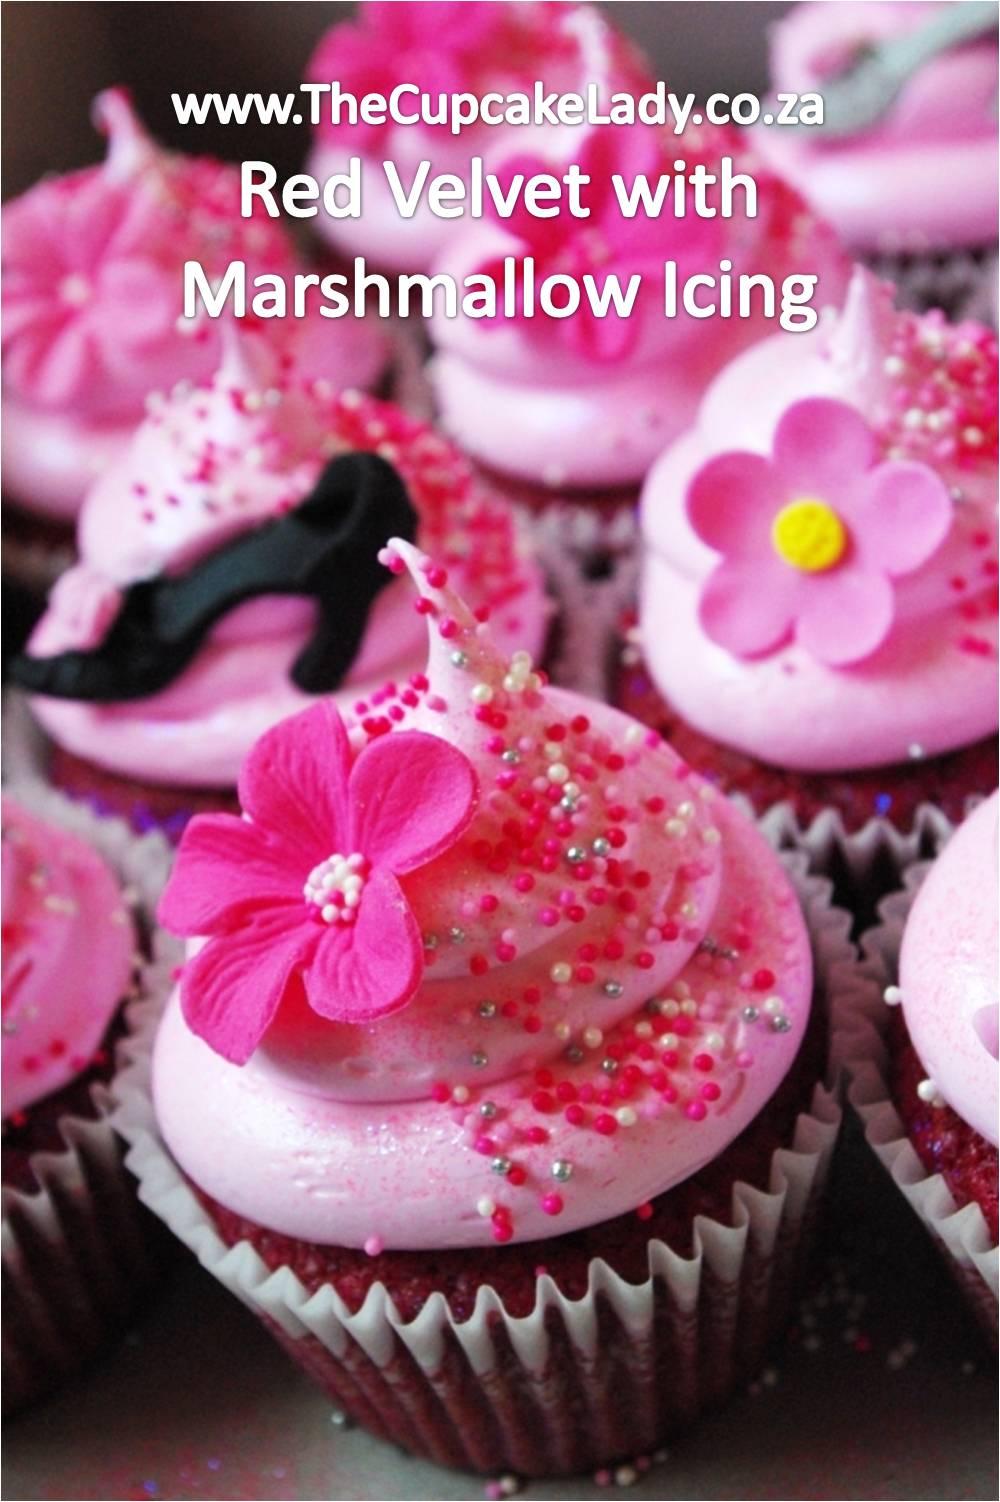 red velvet cupcakes, pink marshmallow icing, pink sprinkles, pink sugarpaste decorations, pink fondant decorations